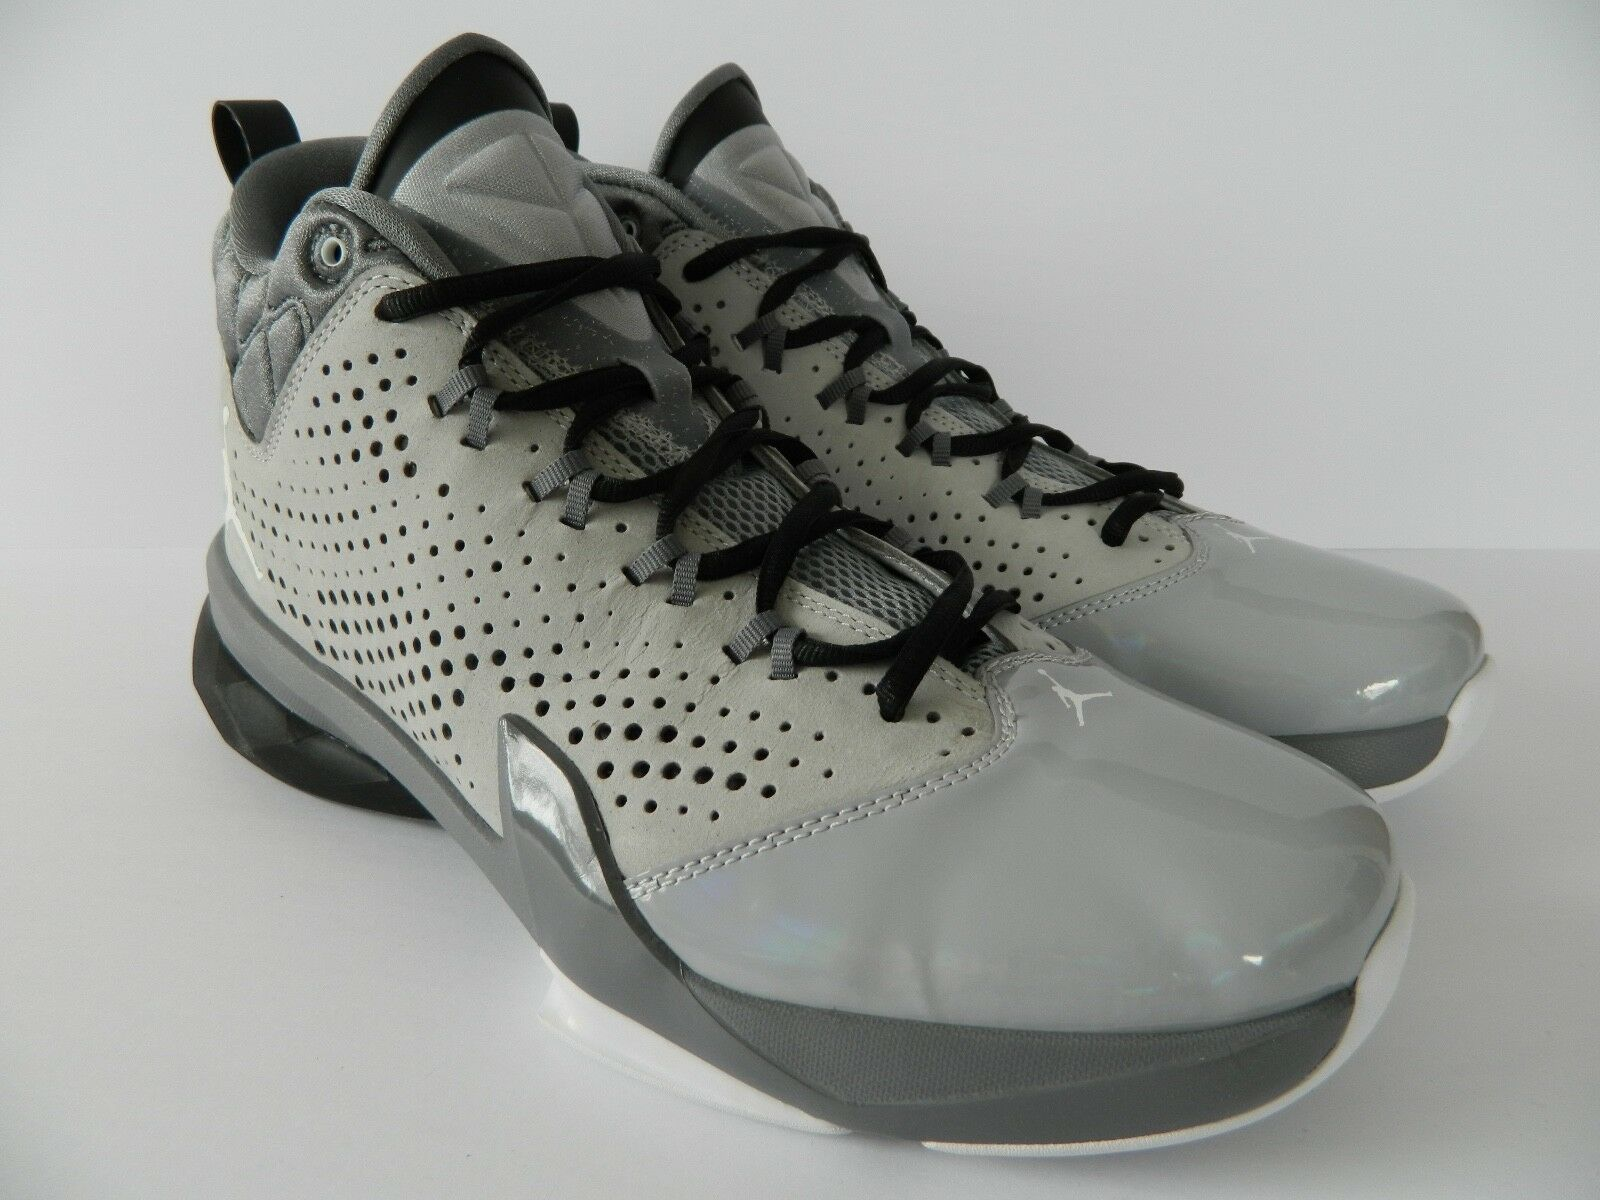 Nike Jordan Flight Time 14.5  ( Wolf Grey/Wht-Cool Grey-Blk) ( 654272 003 ) NIB